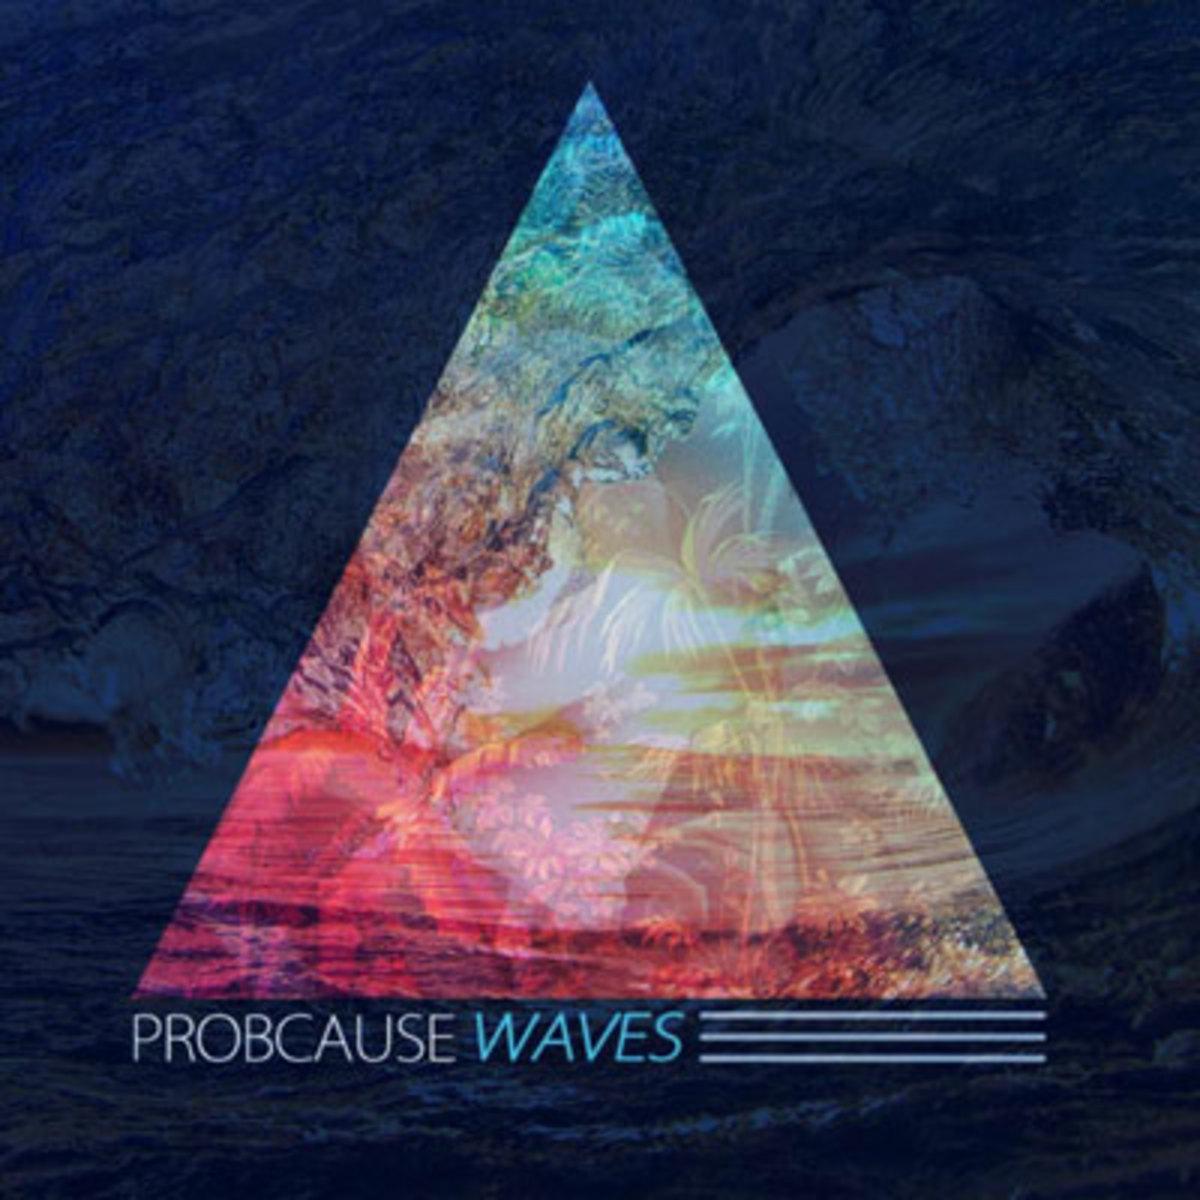 probcause-waves.jpg